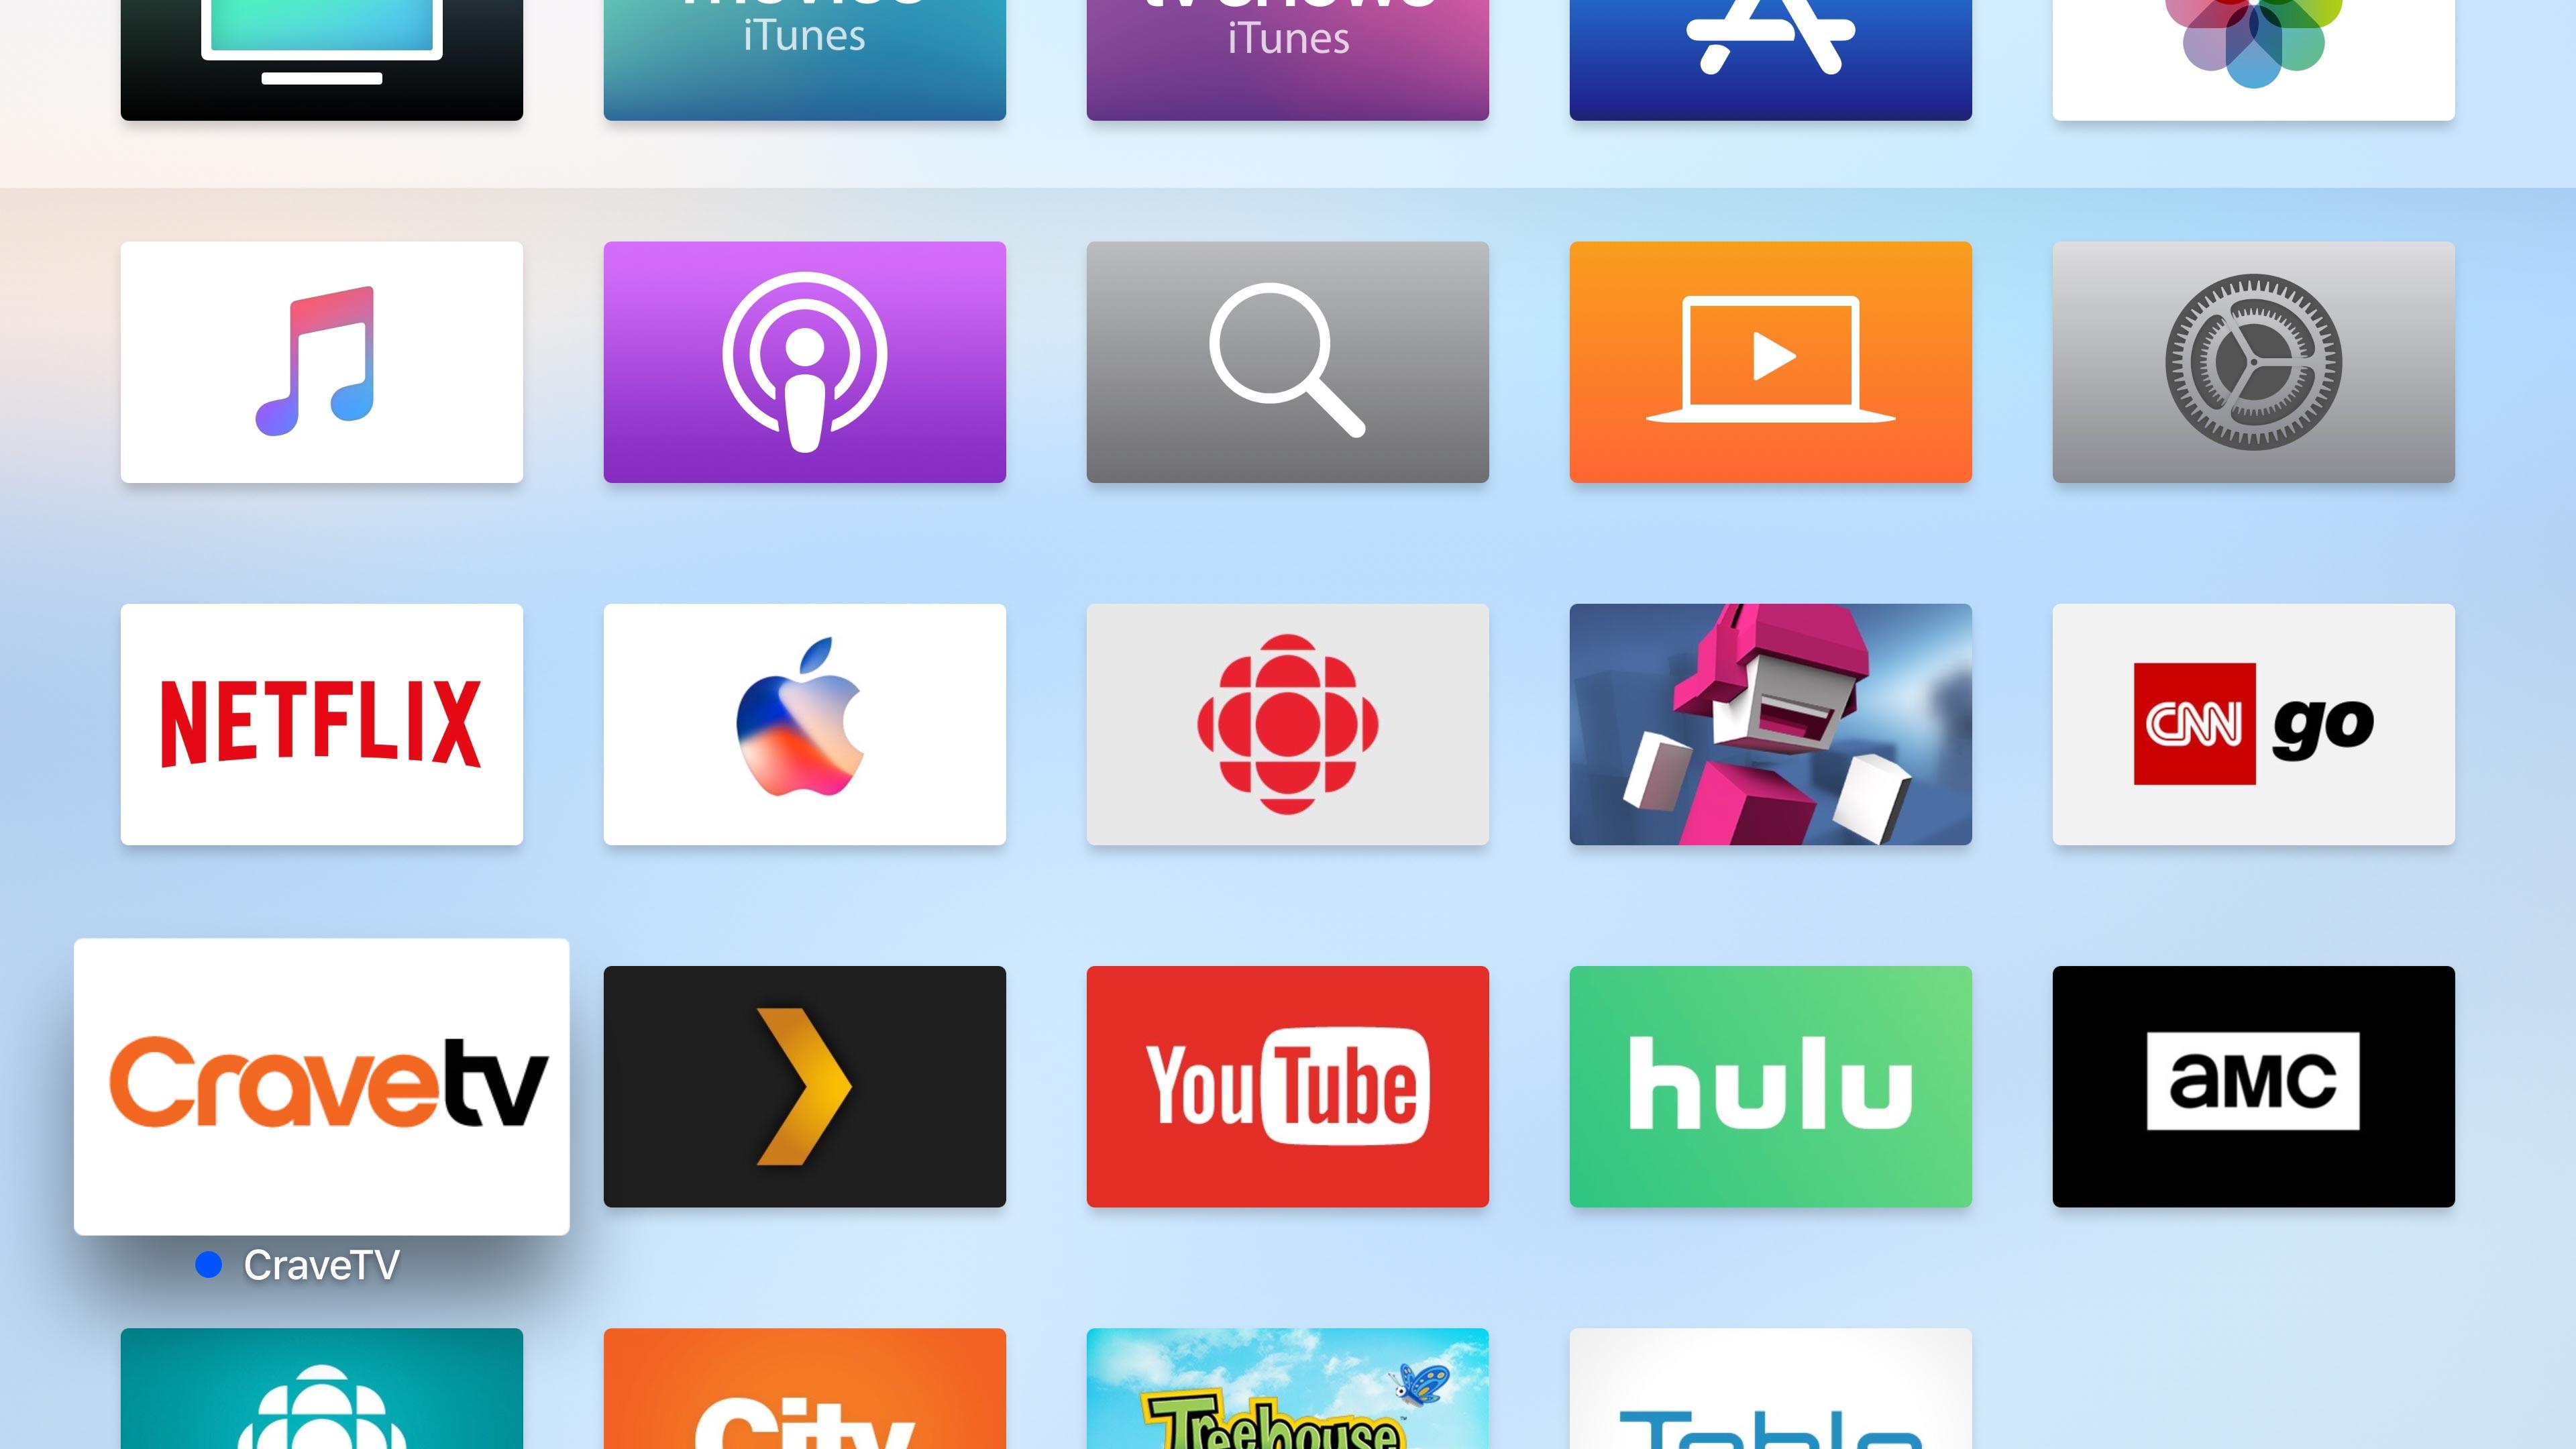 Apple TV 4K UI screenshot